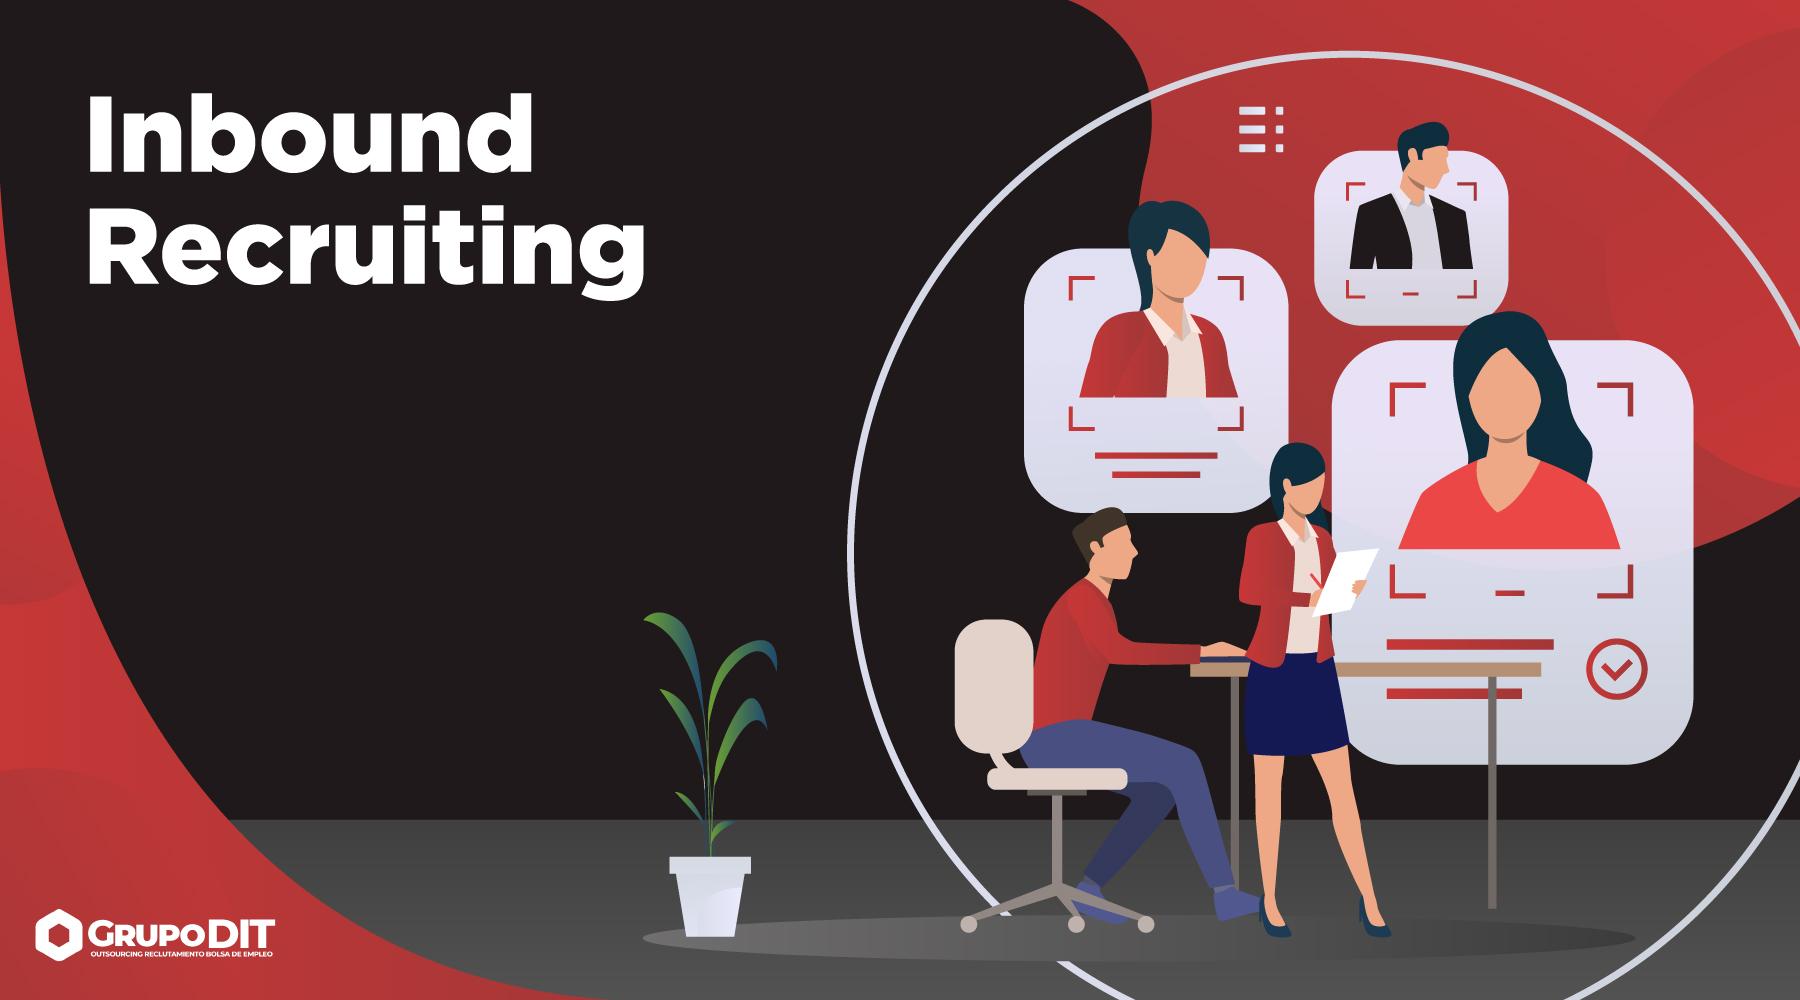 Inbound-Recruiting-por-Grupo-DIT